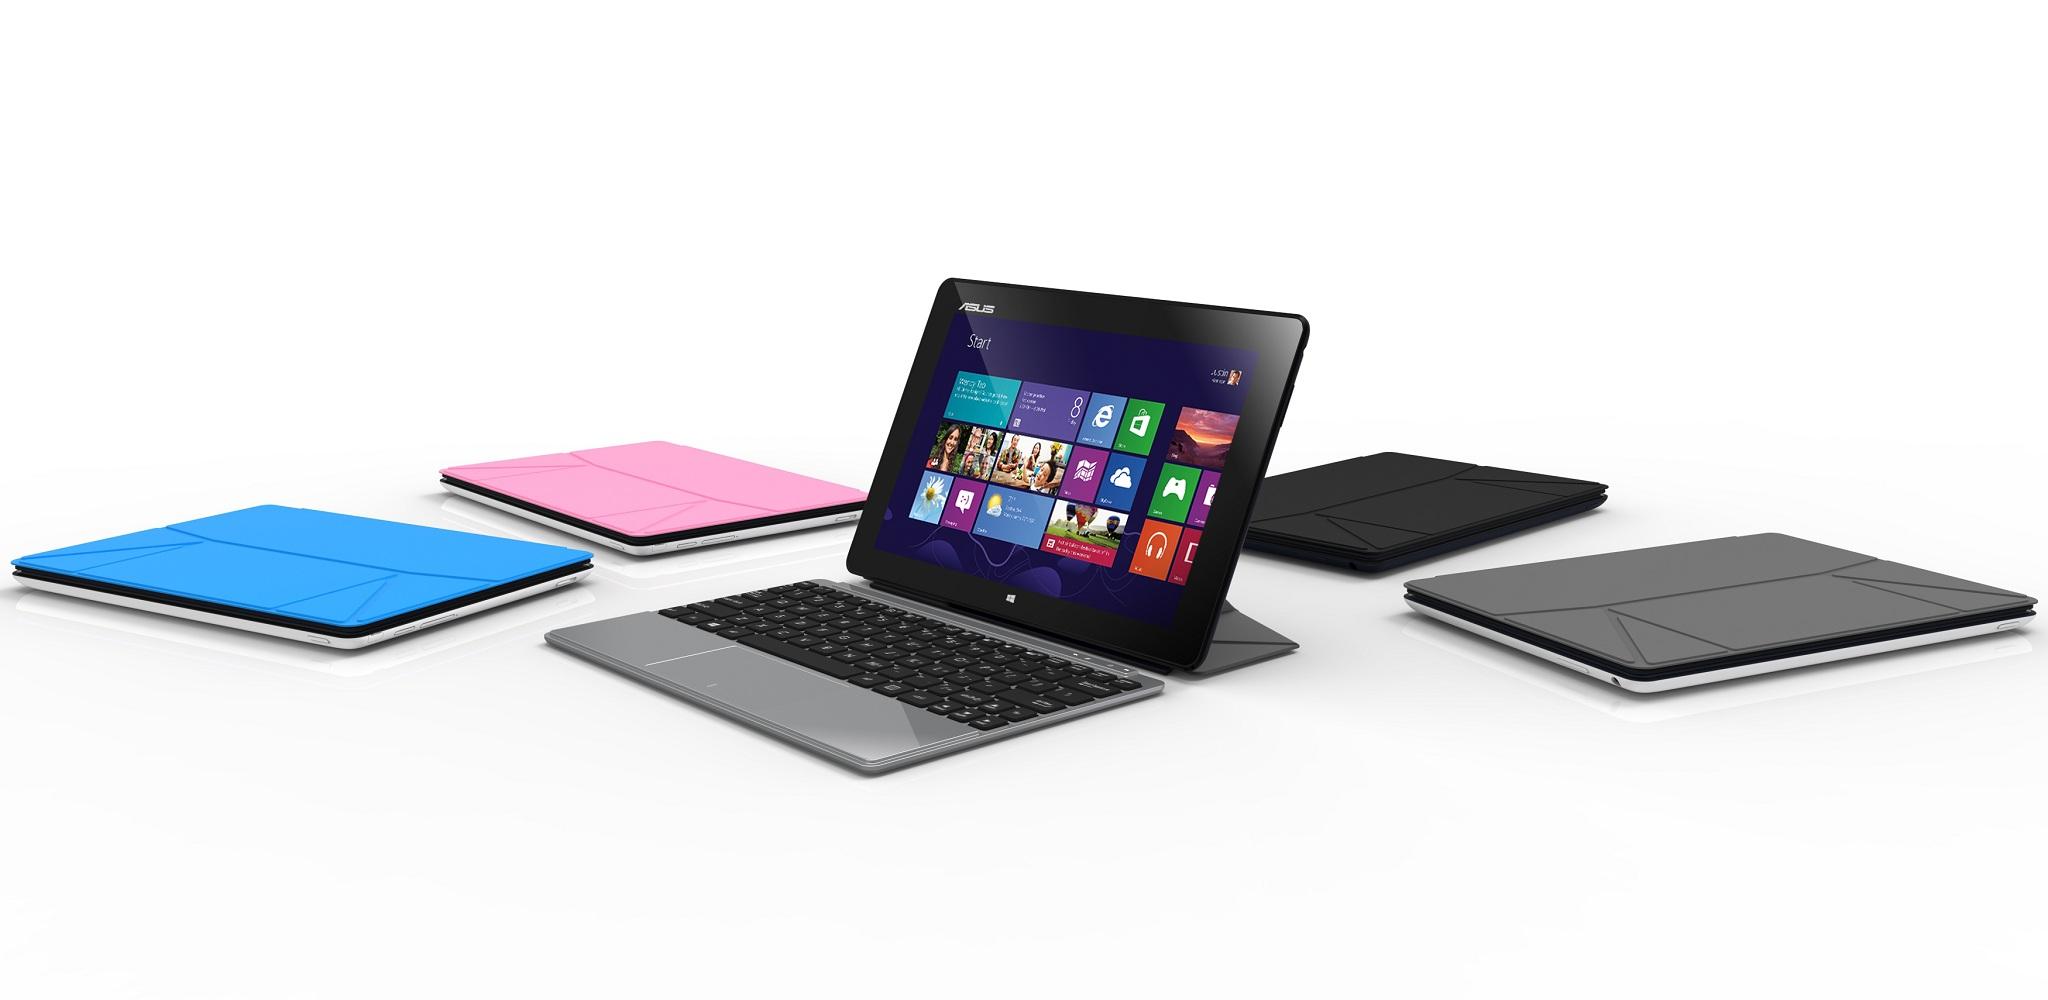 ASUS VivoTab Smart with Sleeves and Bluetooth keyboarda - Asus VivoTab Smart, une tablette Windows 8 avec clavier